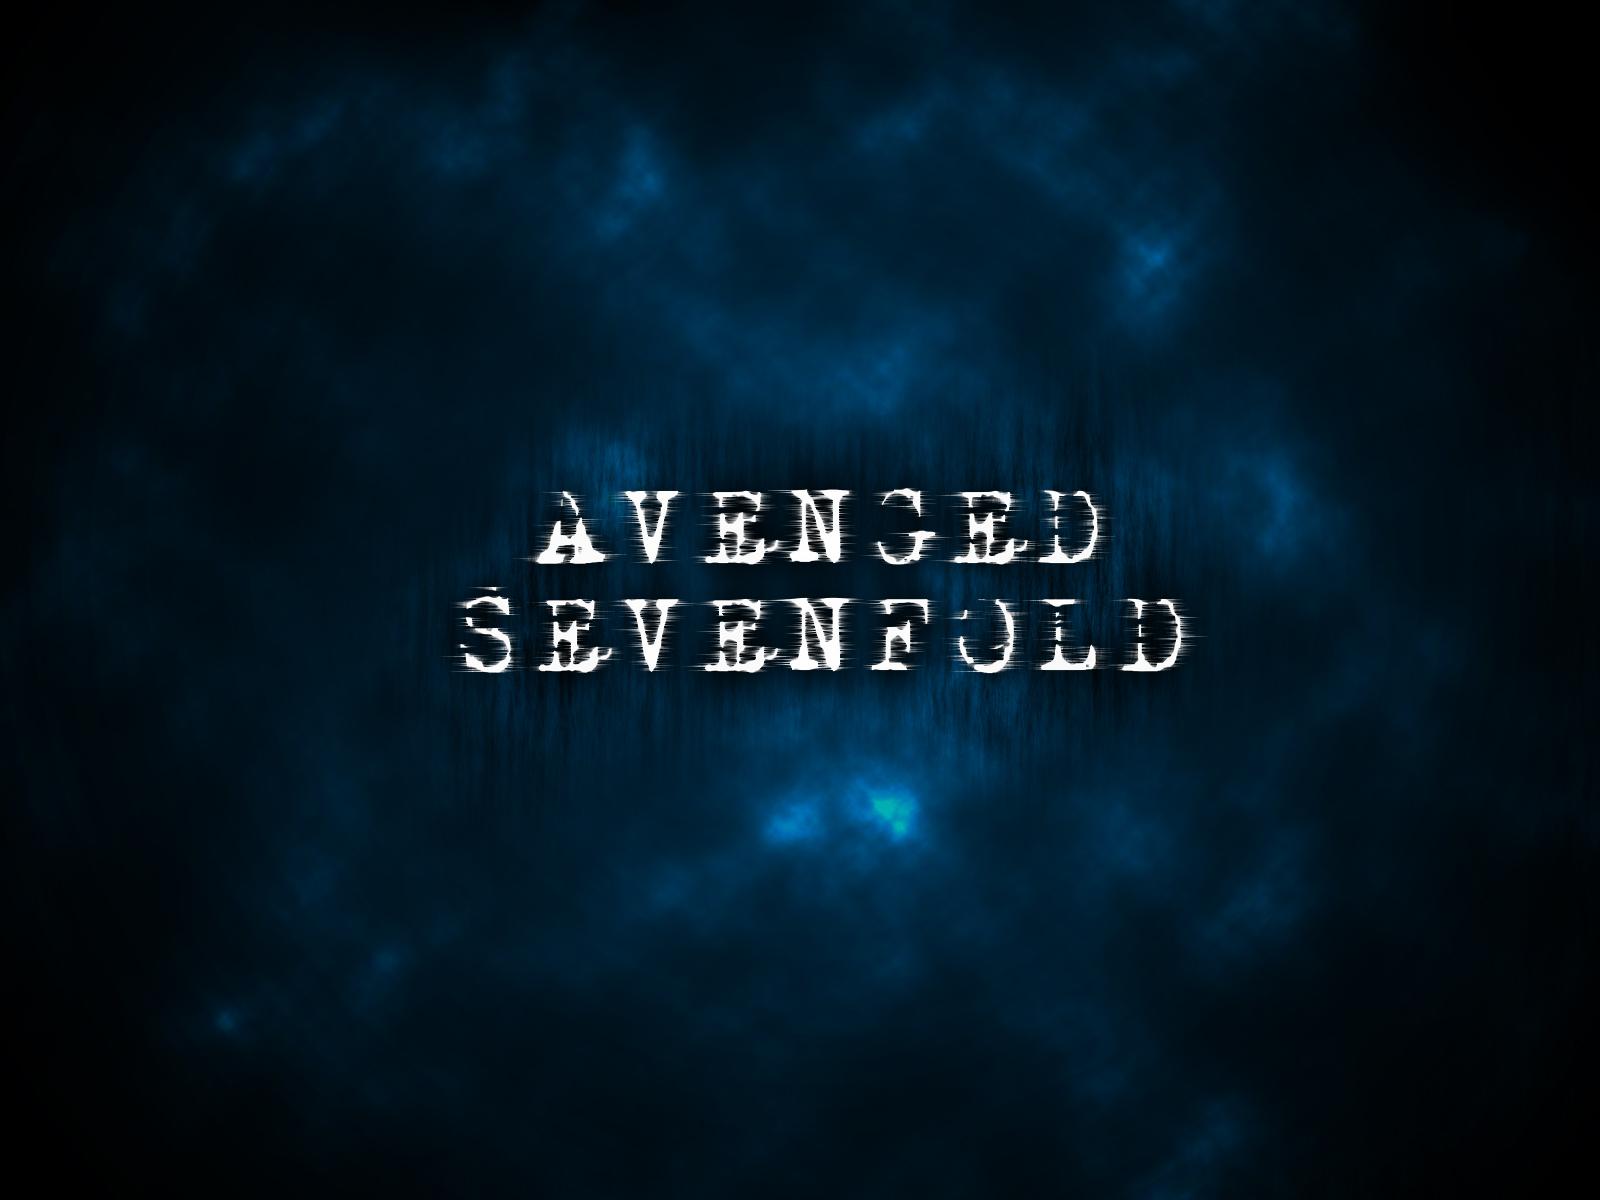 Avenged sevenfold heavy metal rock s wallpaper 1600x1200 45867 avenged sevenfold heavy metal rock s wallpaper 1600x1200 45867 wallpaperup voltagebd Images